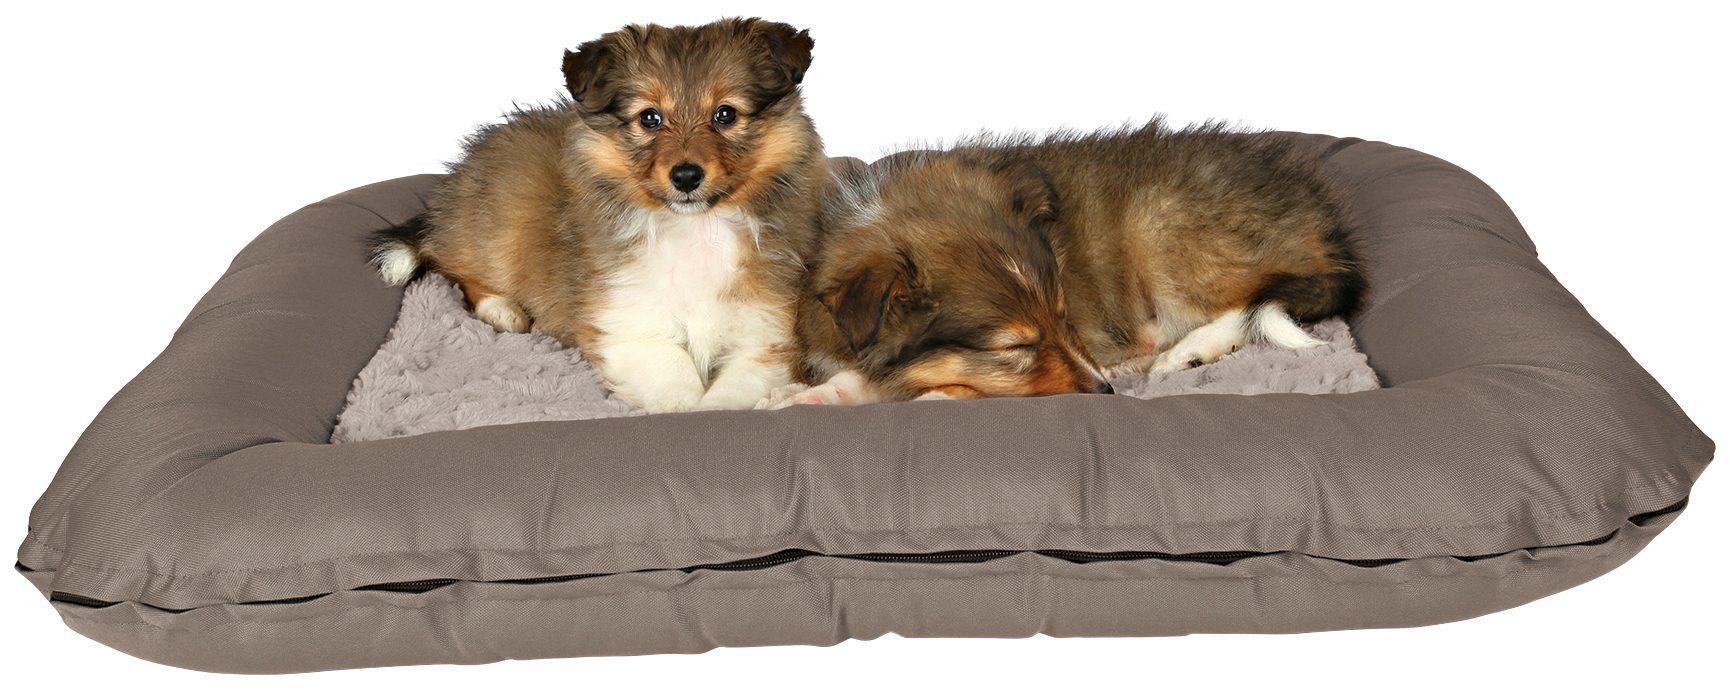 Hundekissen »Drago Cosy«, BxL: 100x70 cm, taupe/beige